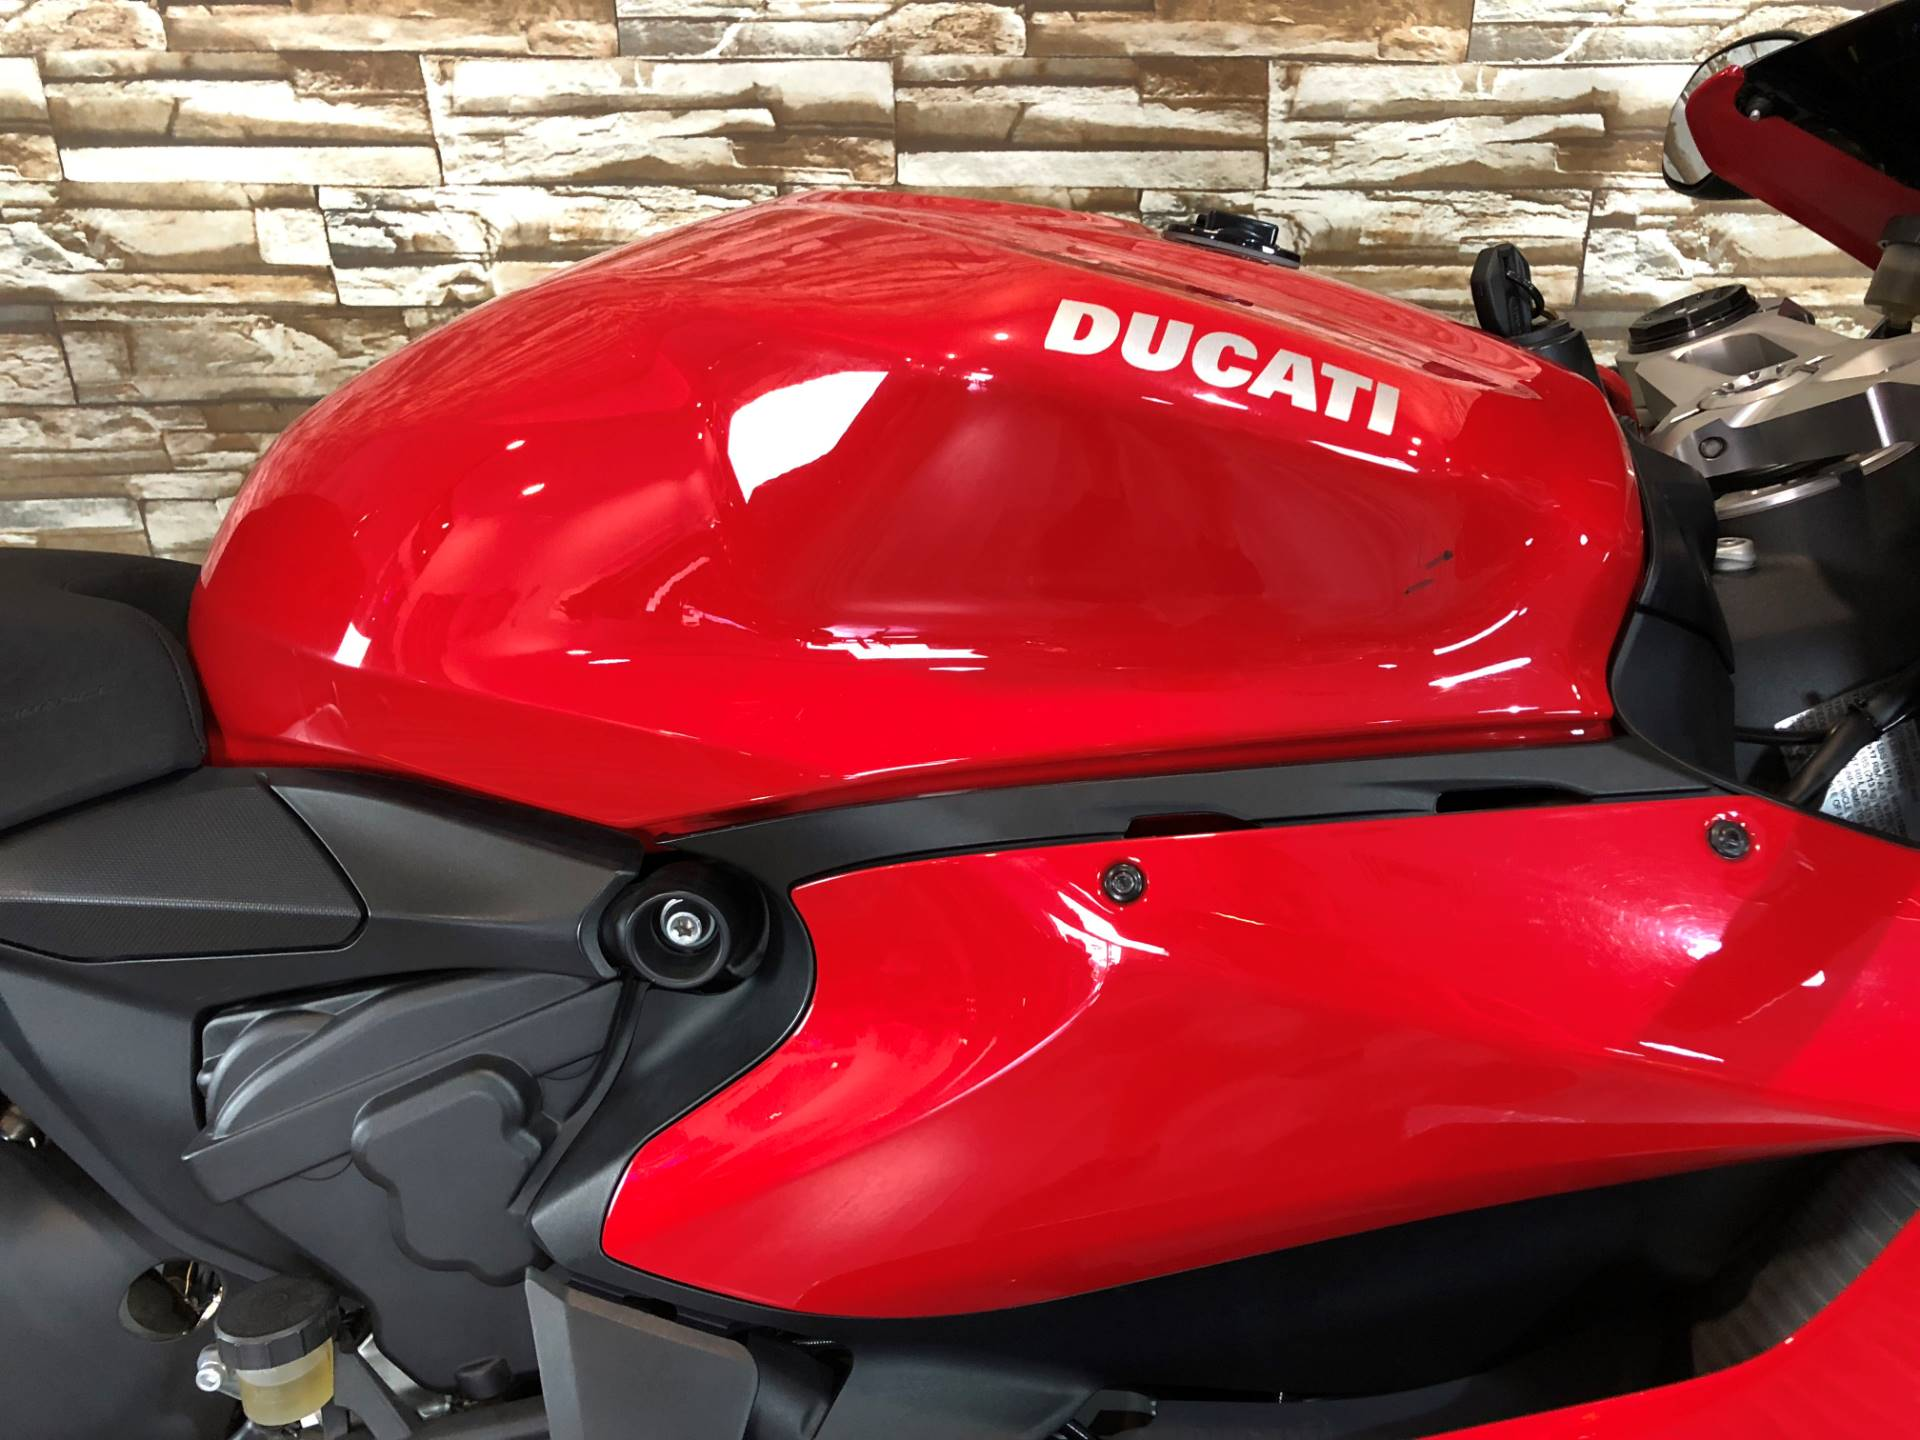 2014 Ducati Superbike 899 Panigale 11